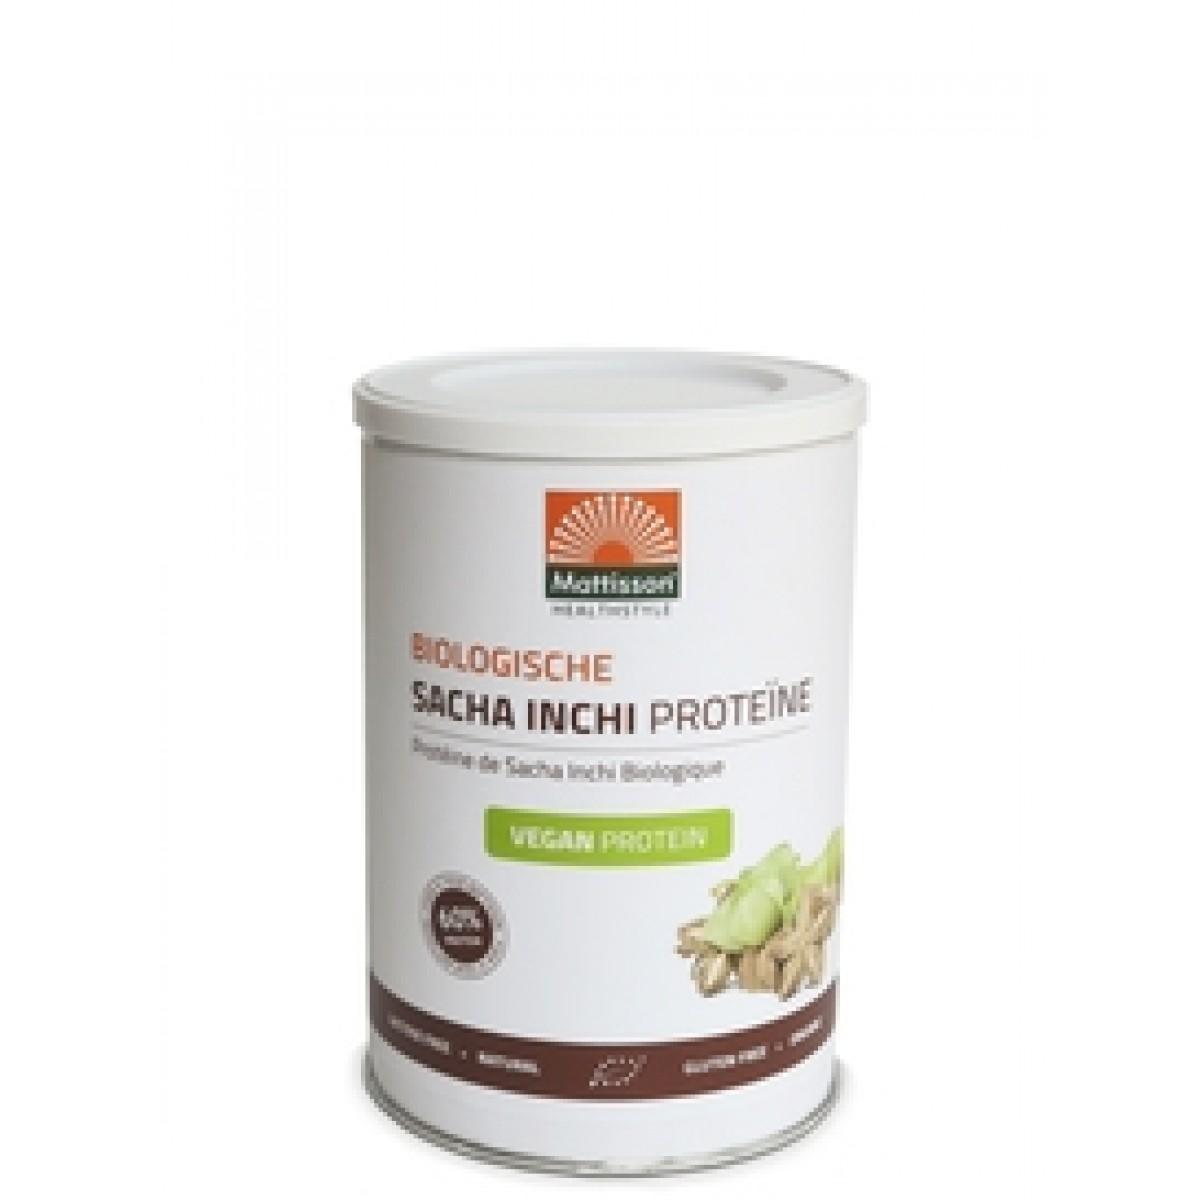 Sacha Inchi Proteine Poeder